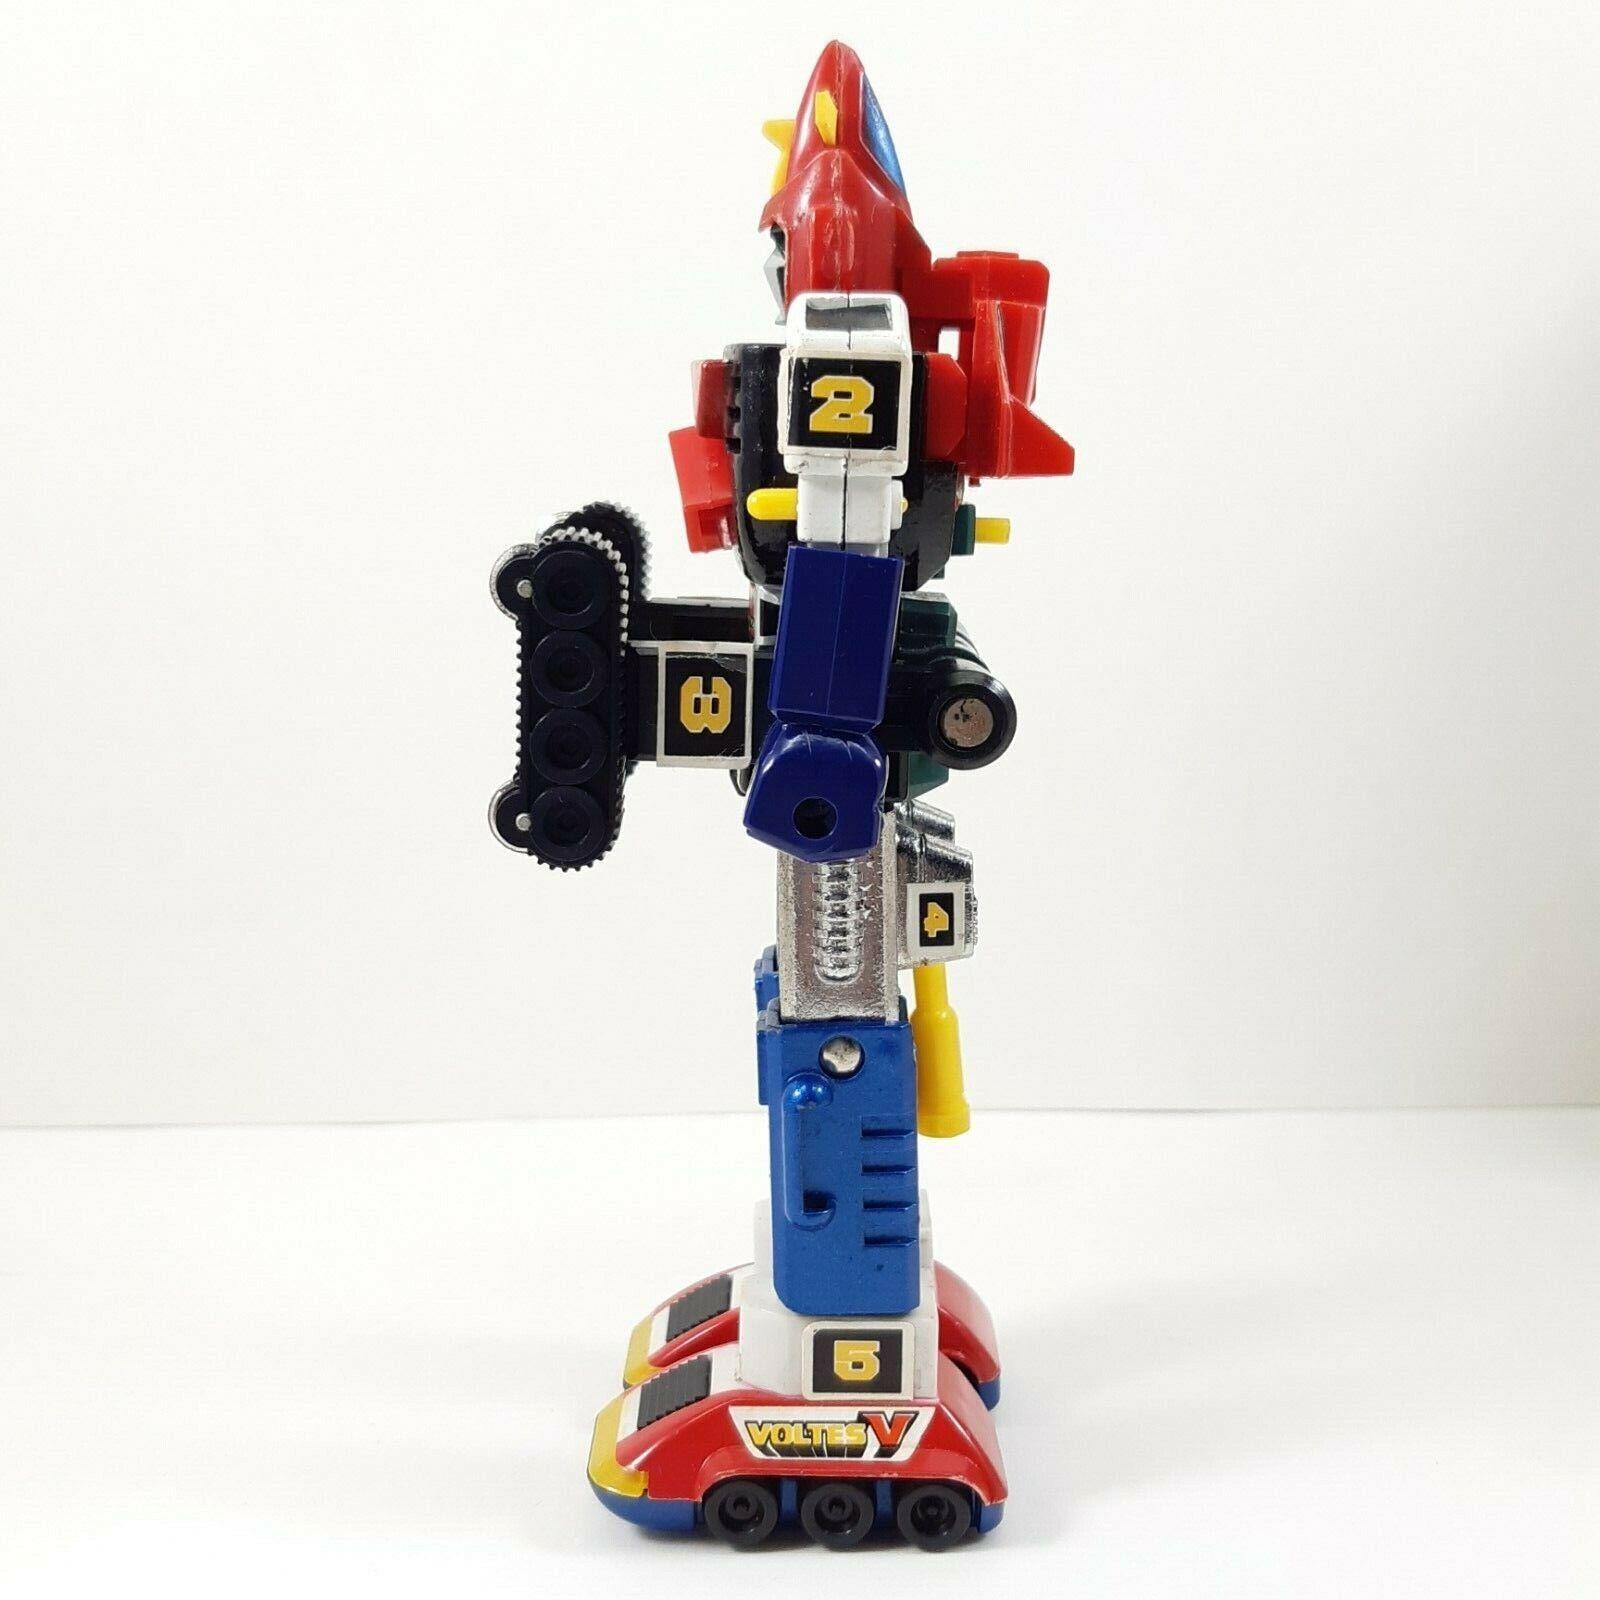 Rare Chogokin Chogokin Chogokin Voltes V GA-80 cifra Robot Vintage Retro Die-cast Japan POPY 35a903